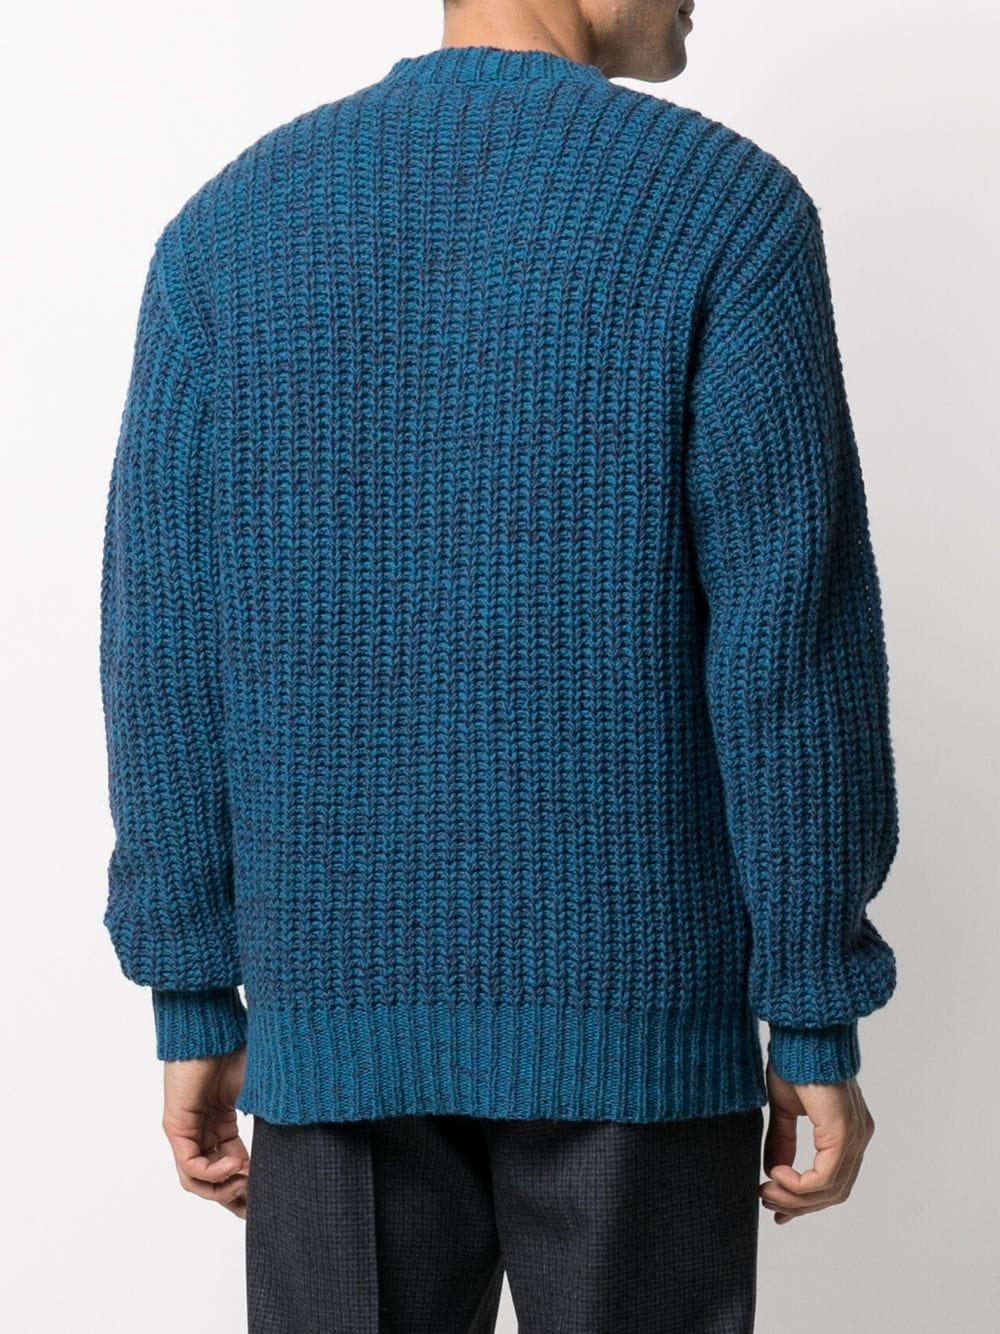 wool sweater man blue MARNI | Sweaters | GCMG0207P0 UFH92400B49